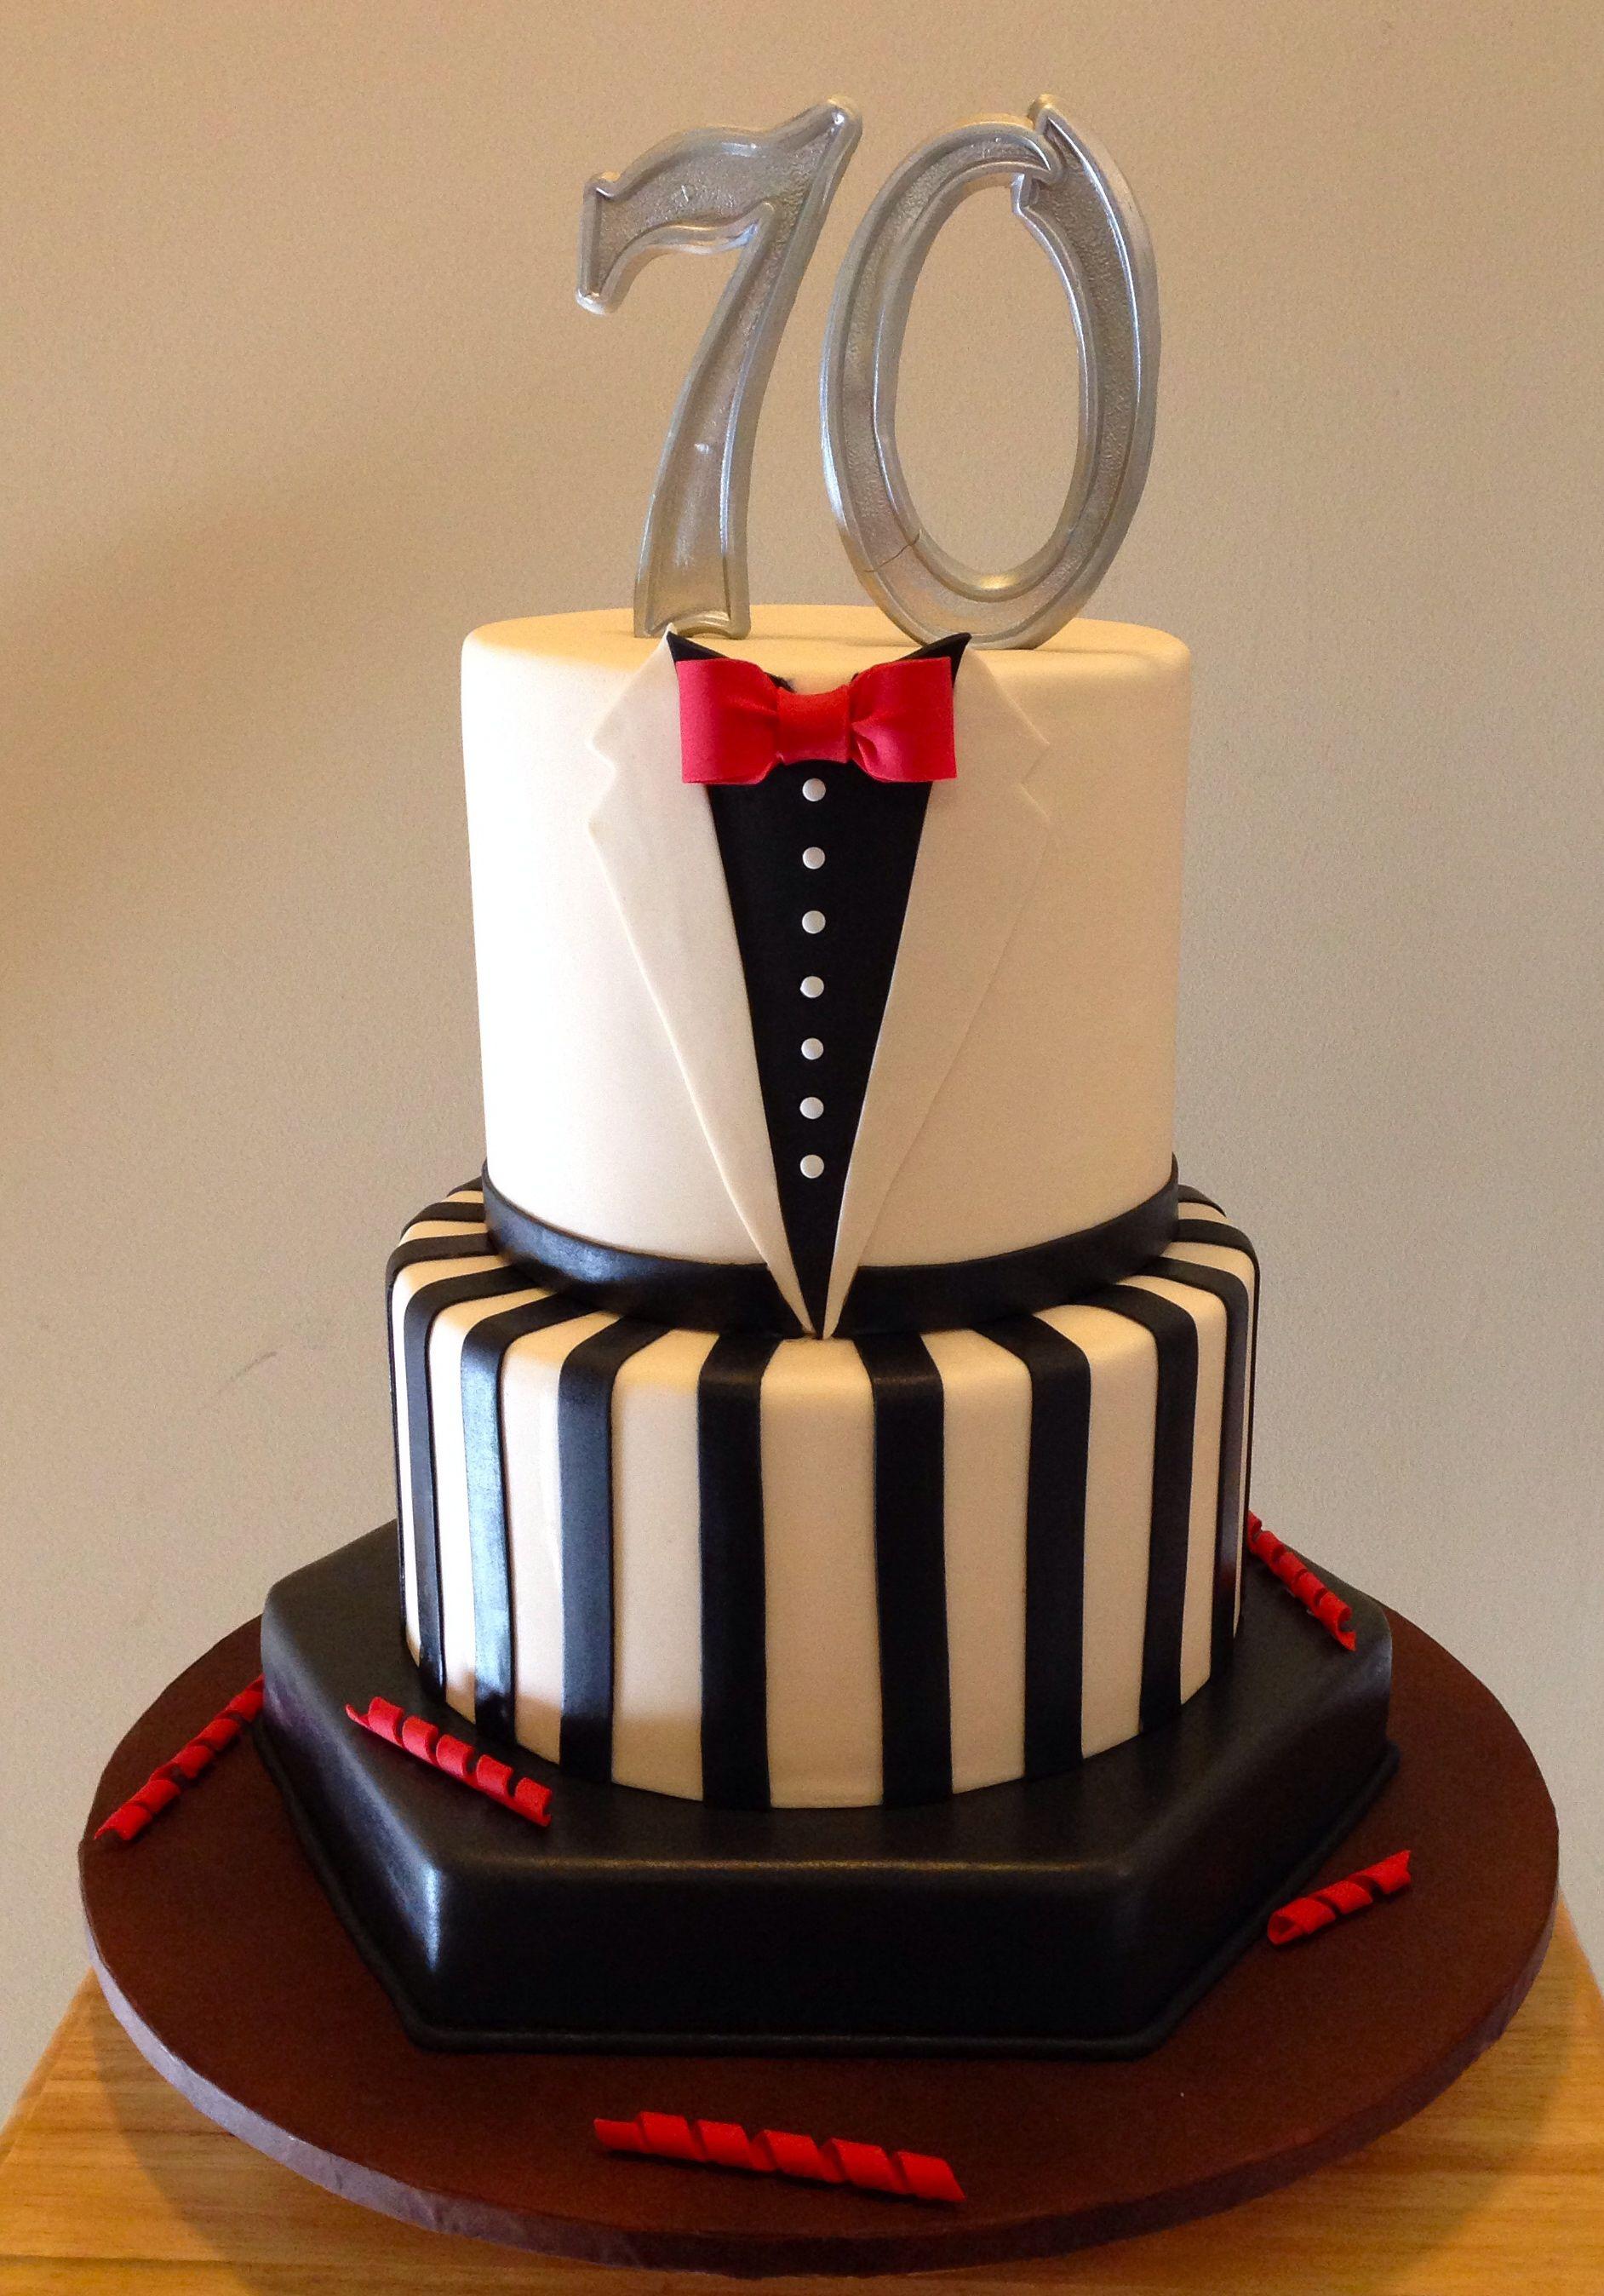 Tuxedo Theme Cake For A 70th Birthday Avant GardeCakeCo